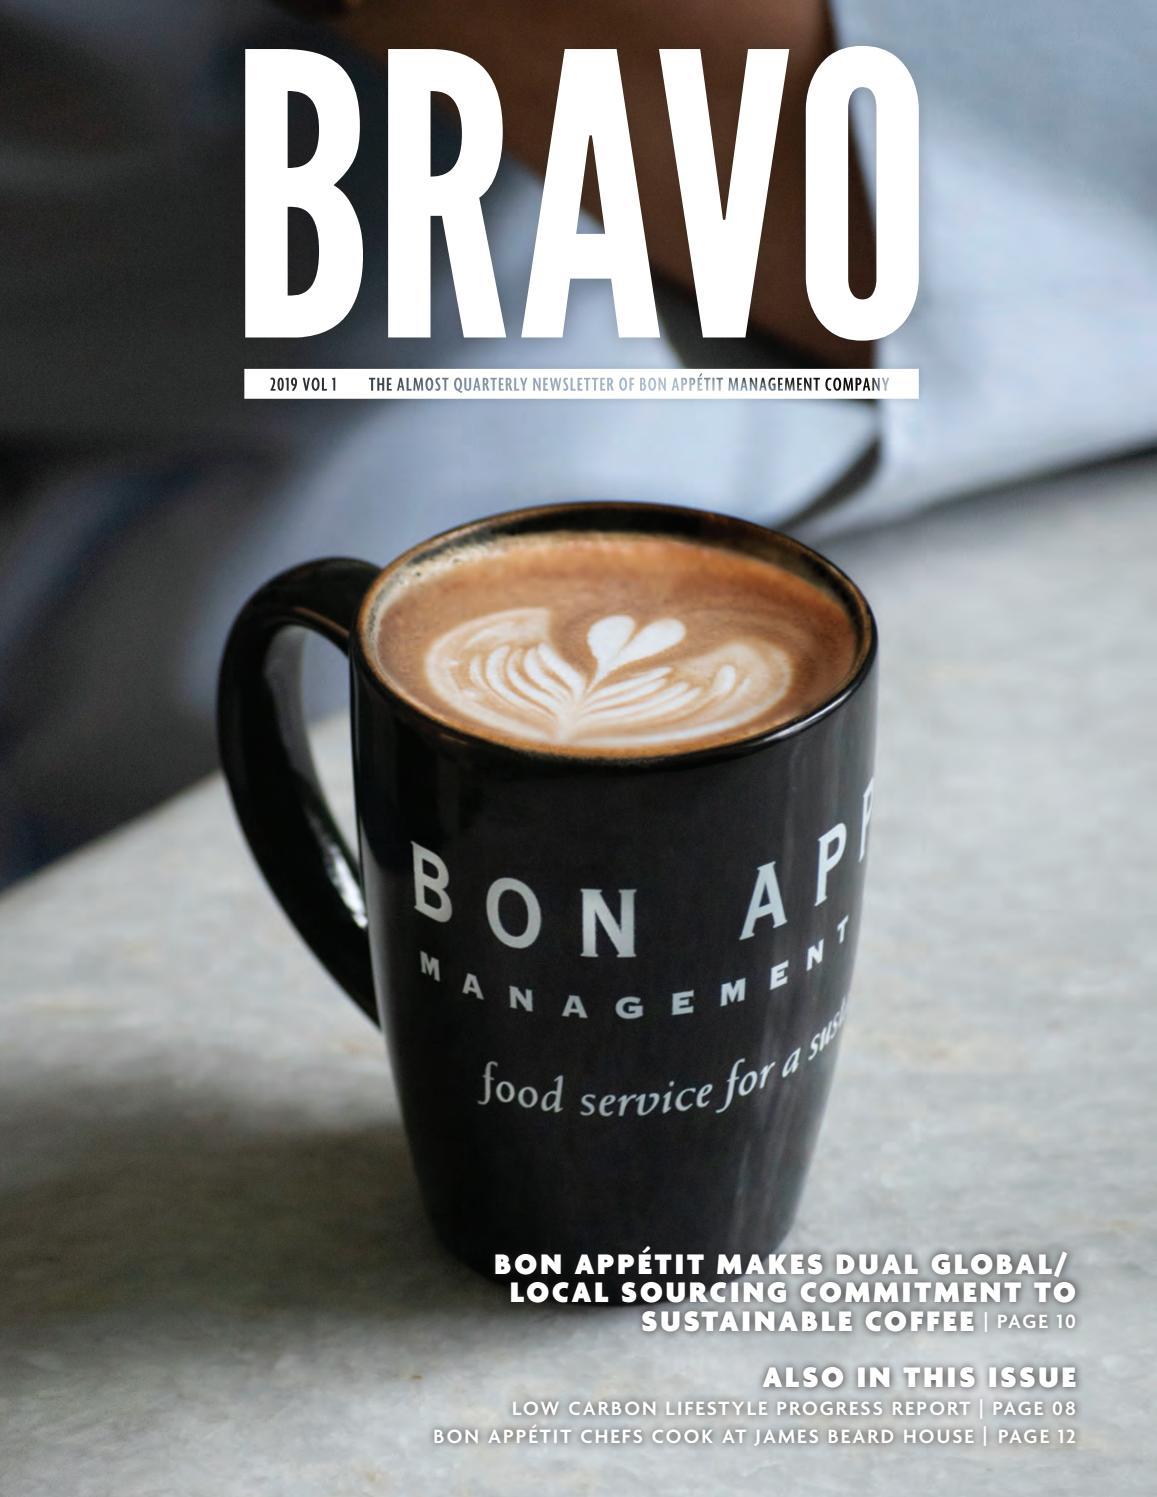 Bravo 2019 Volume 1 By Compass Group Usa Issuu